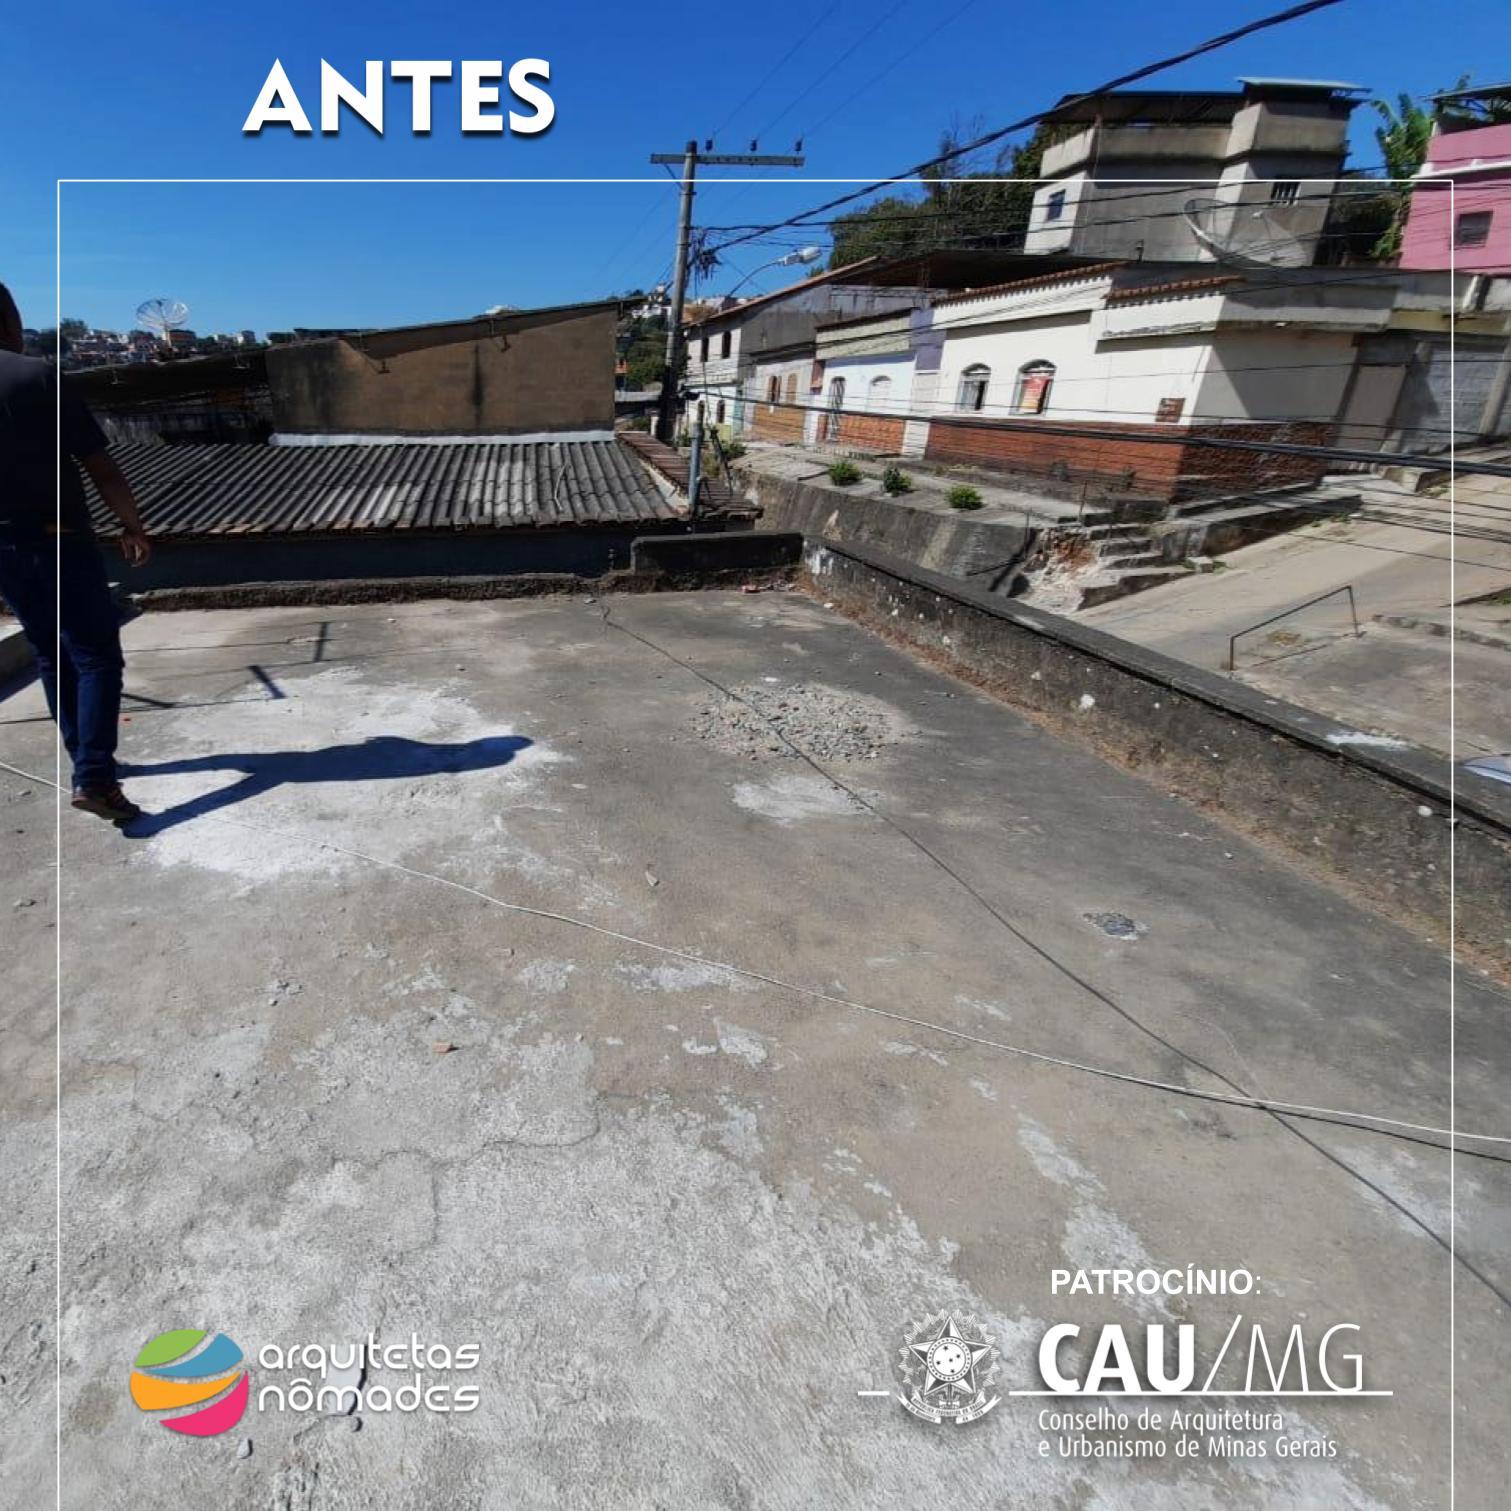 ANTES1-sandra